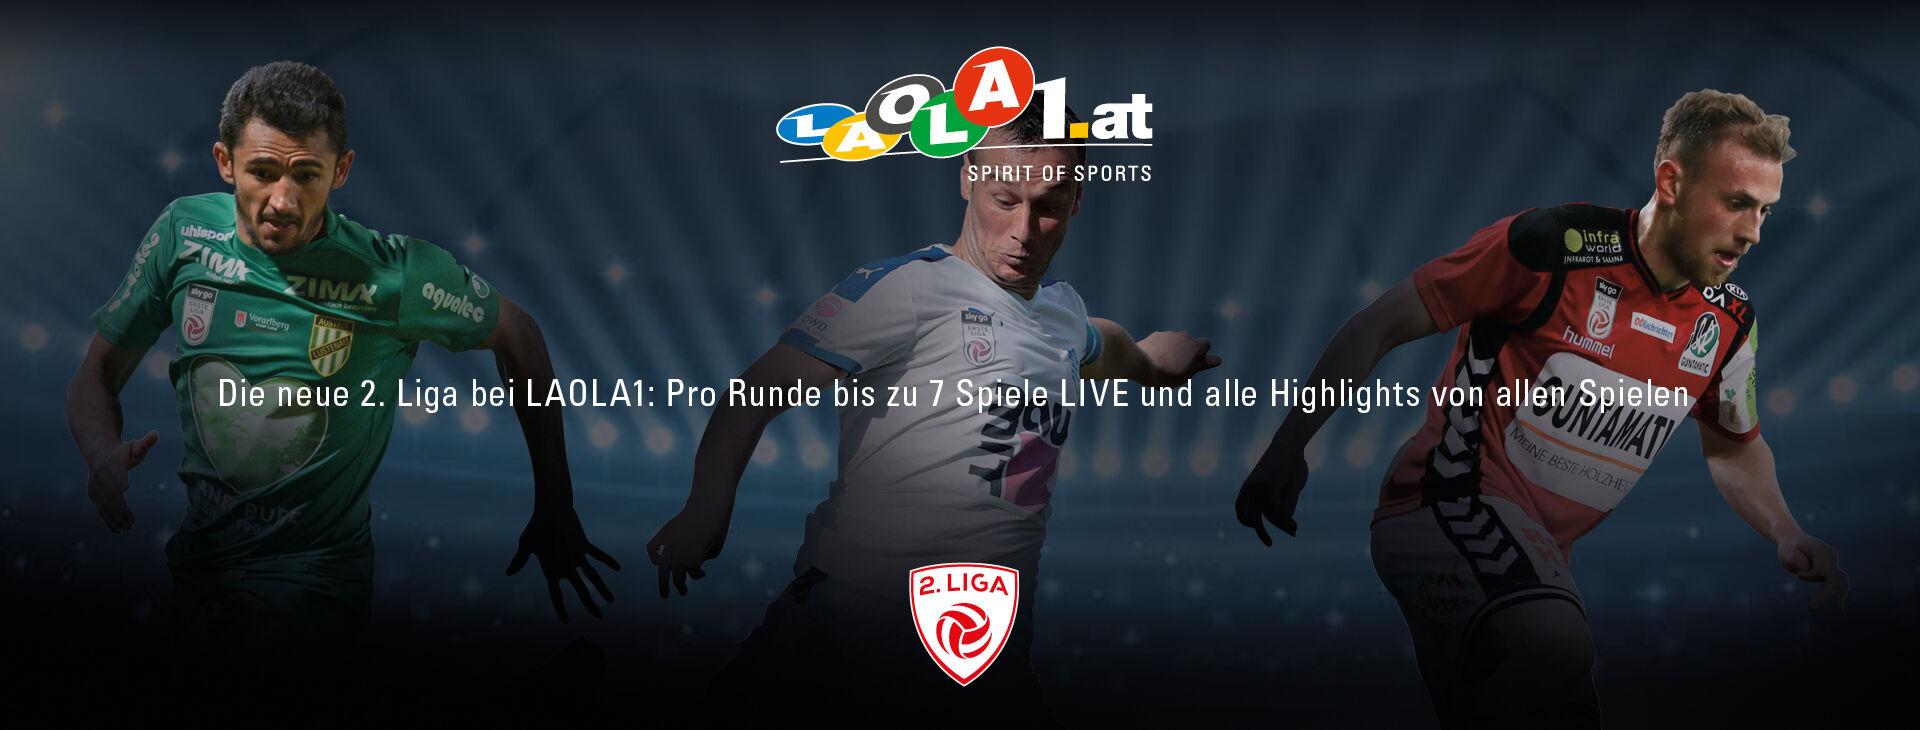 fußball live 2 liga